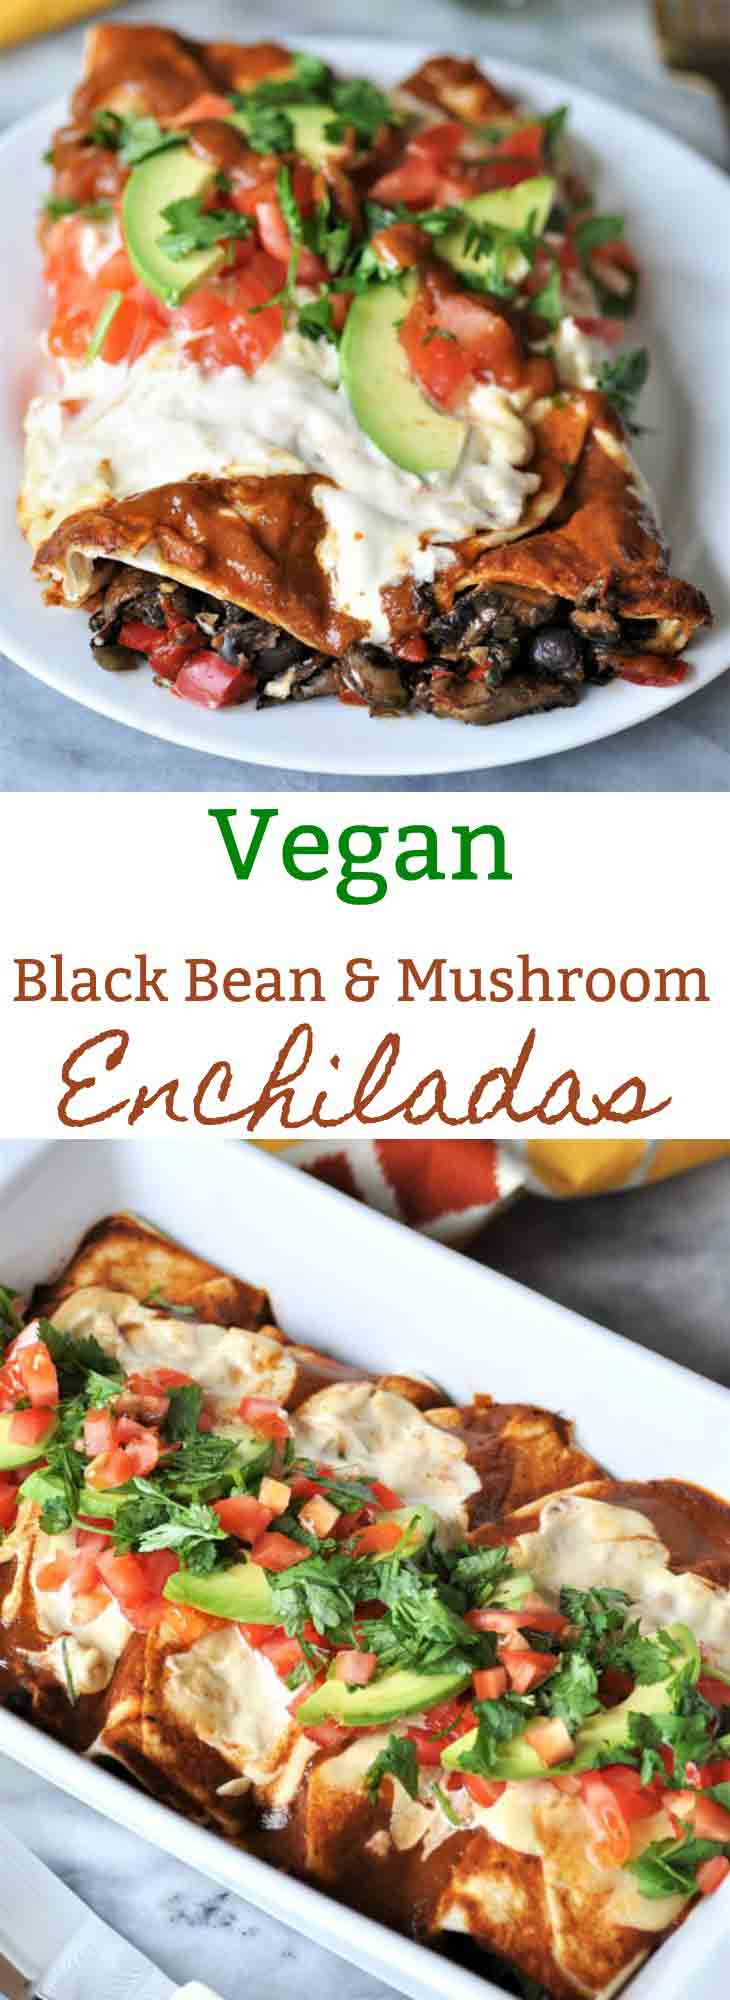 Vegan Black Bean & Mushroom Enchiladas